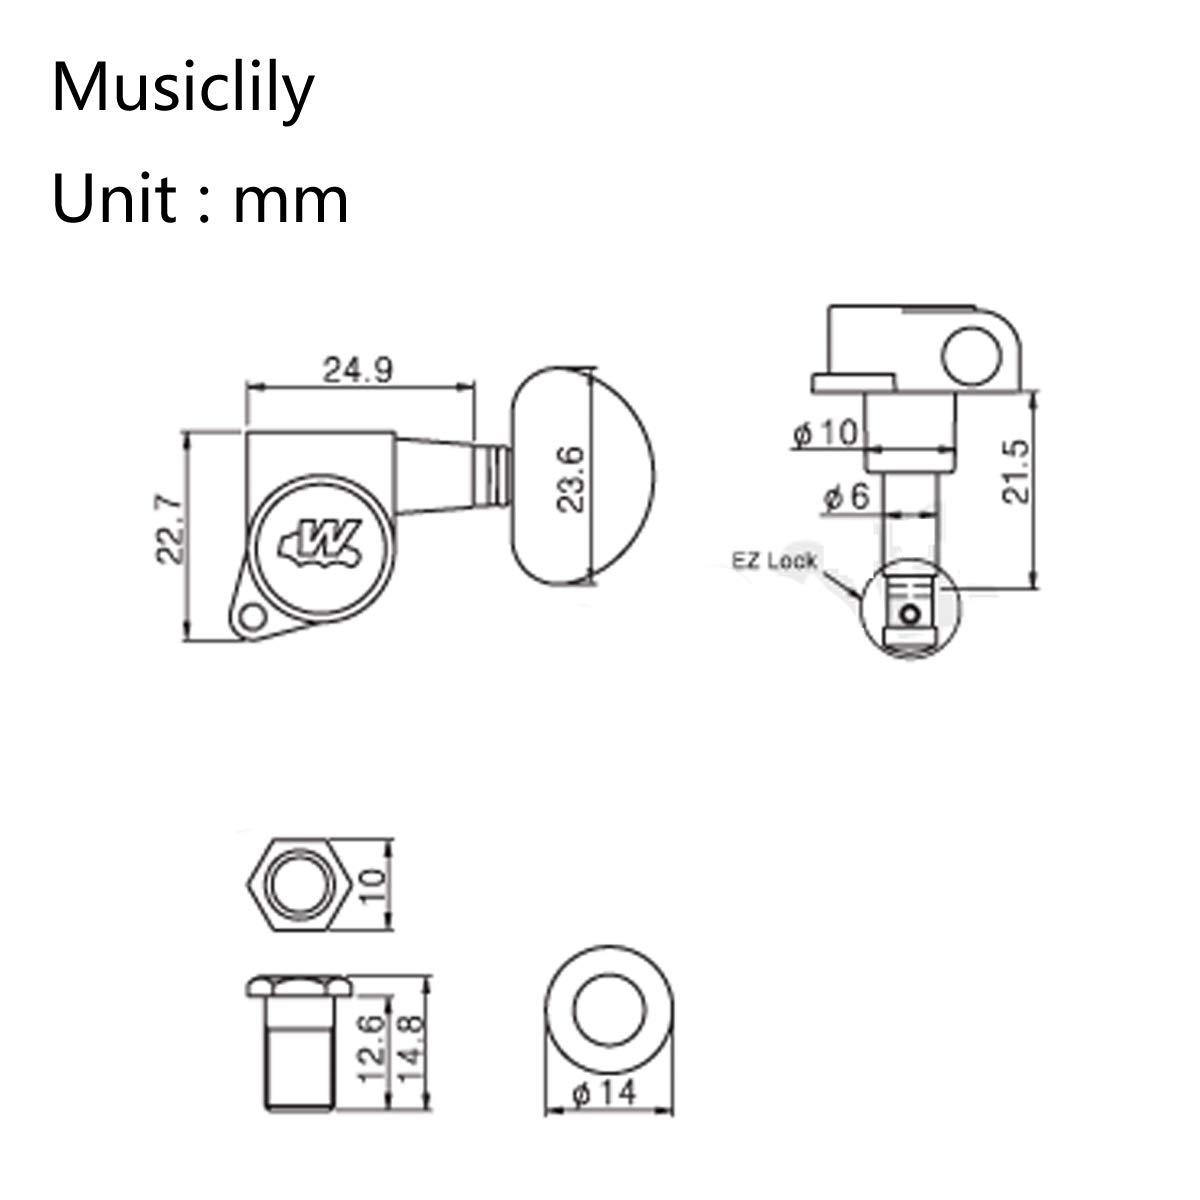 wilkinson humbucker guitar wiring diagram